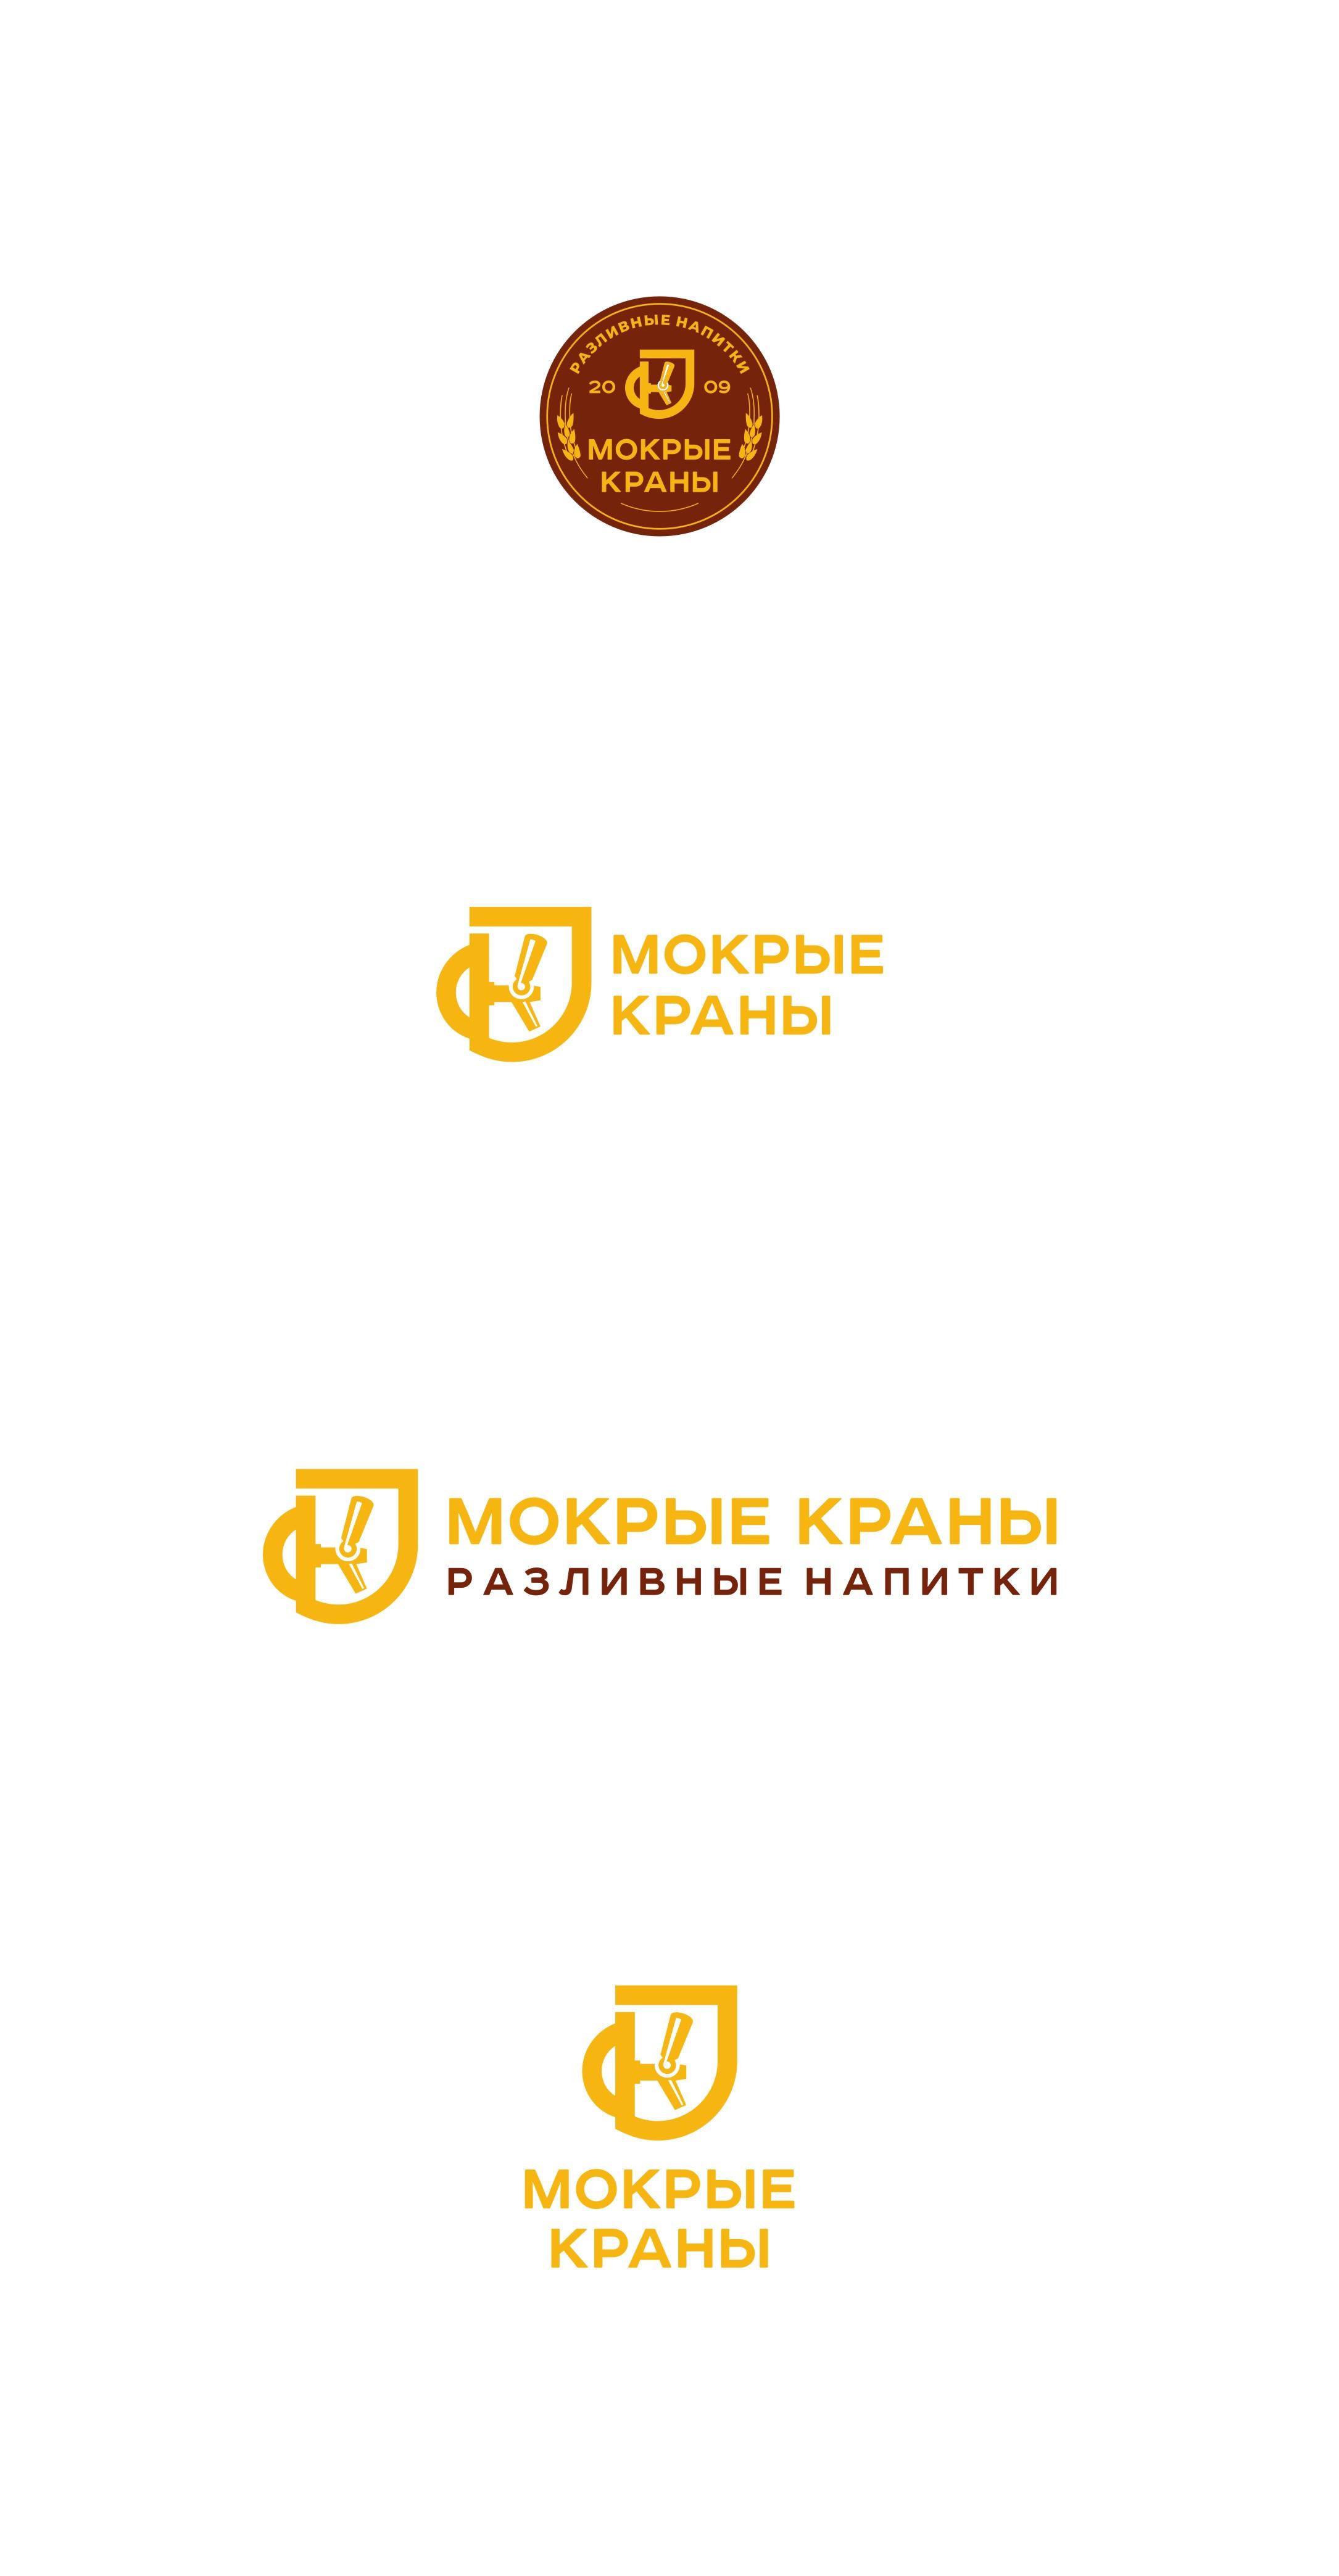 Вывеска/логотип для пивного магазина фото f_3186029627b3b3a4.jpg